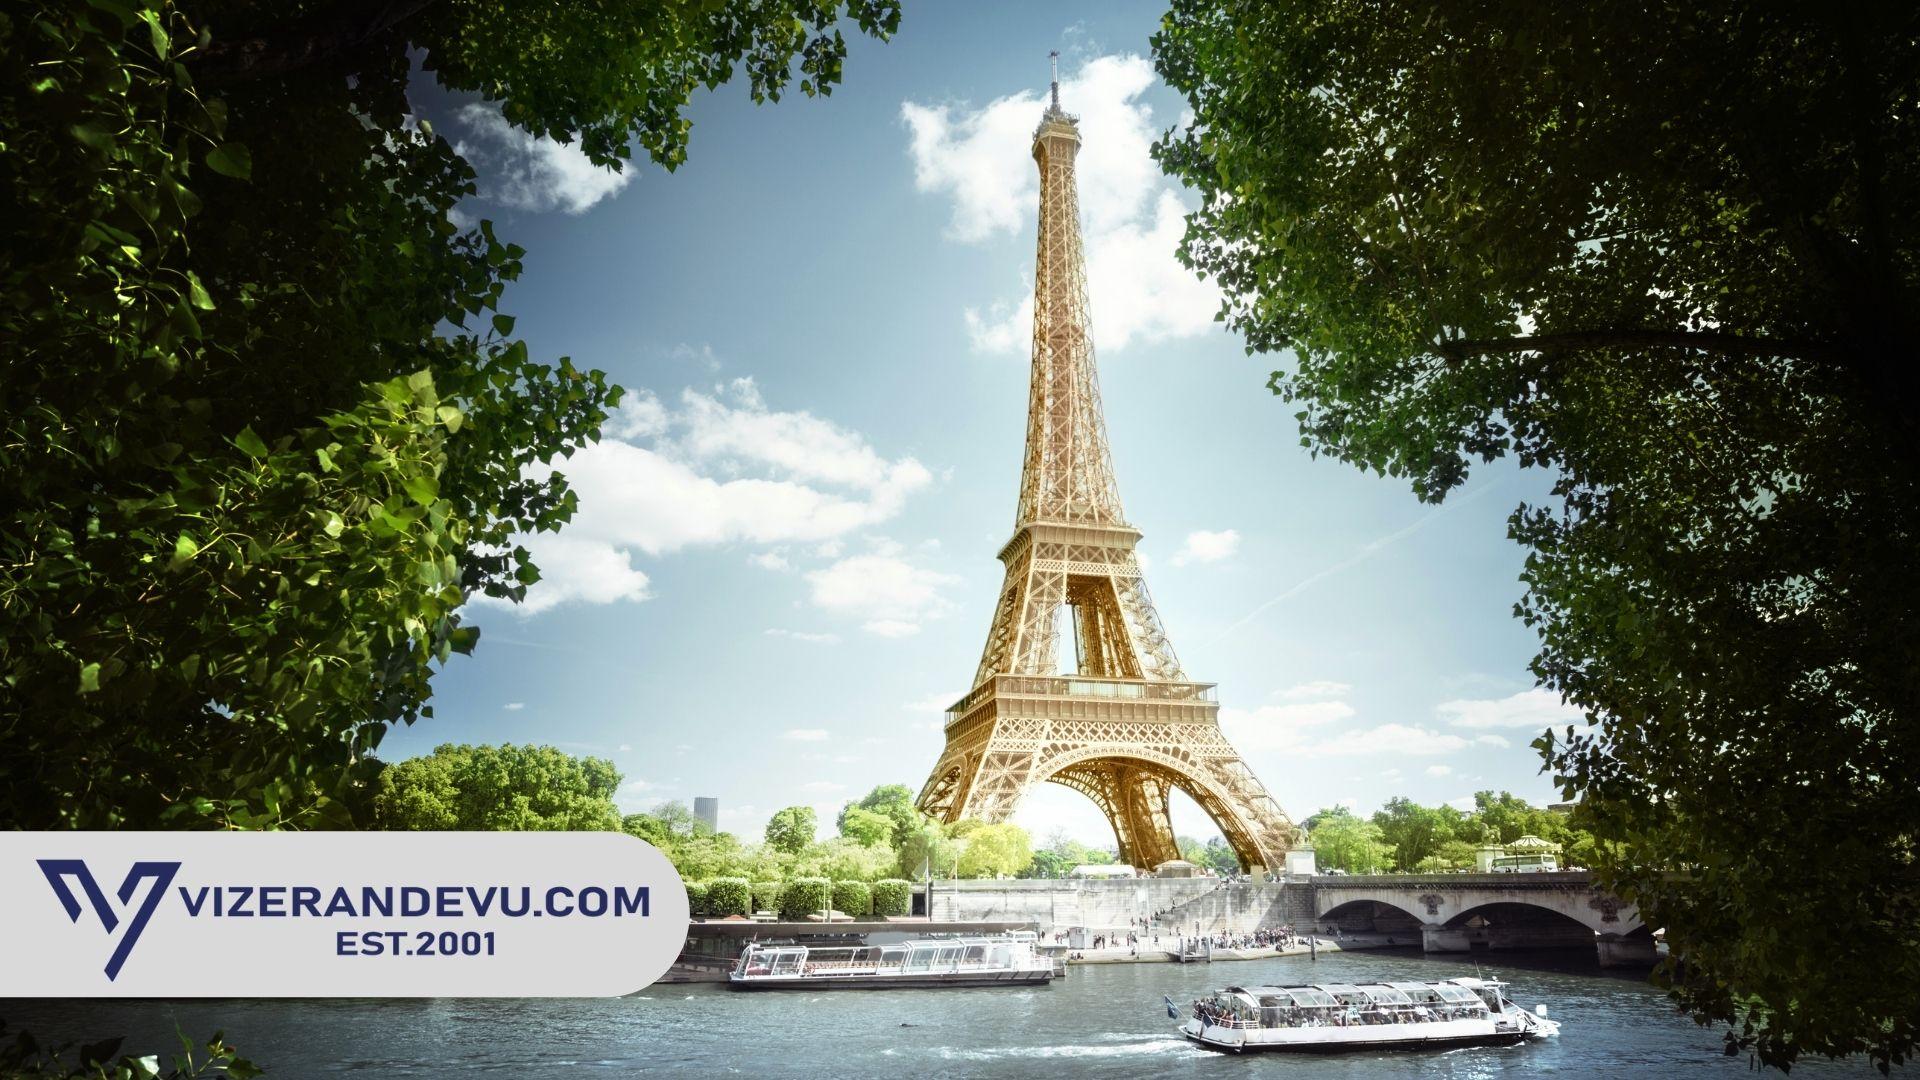 Fransa Vize Formu ve Dilekçe 2021